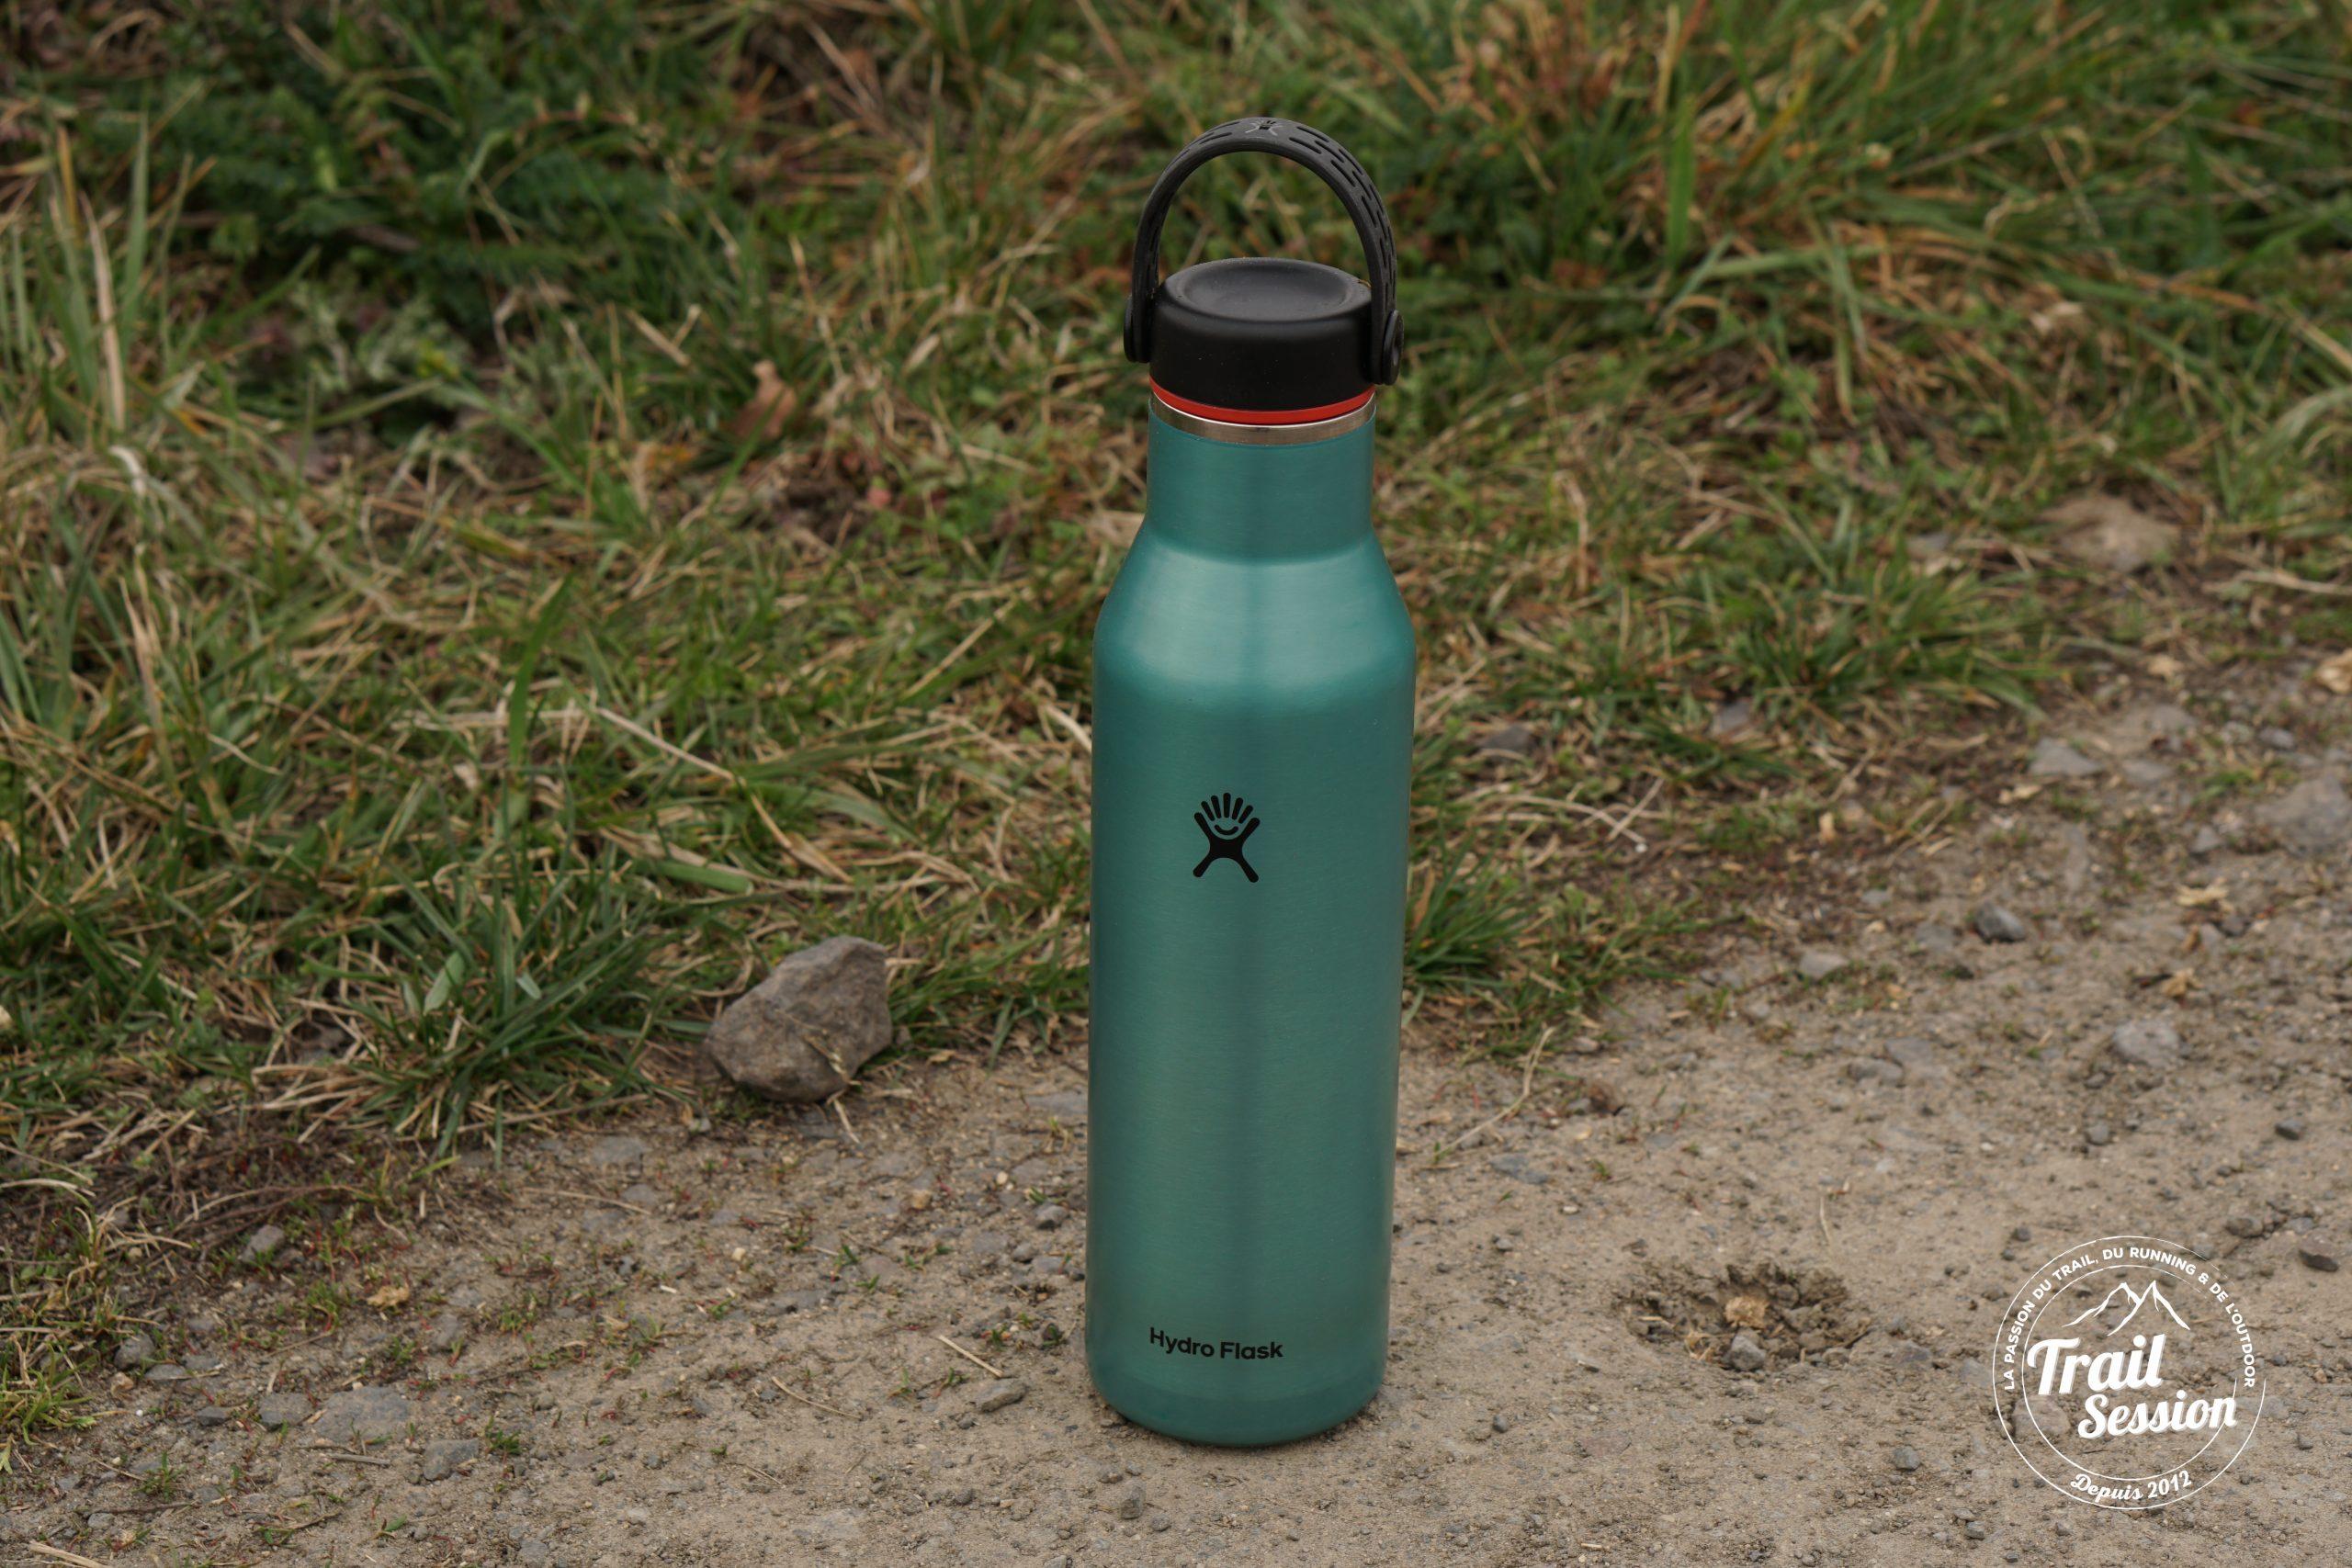 Bouteille Trail Series de Hydro Flask